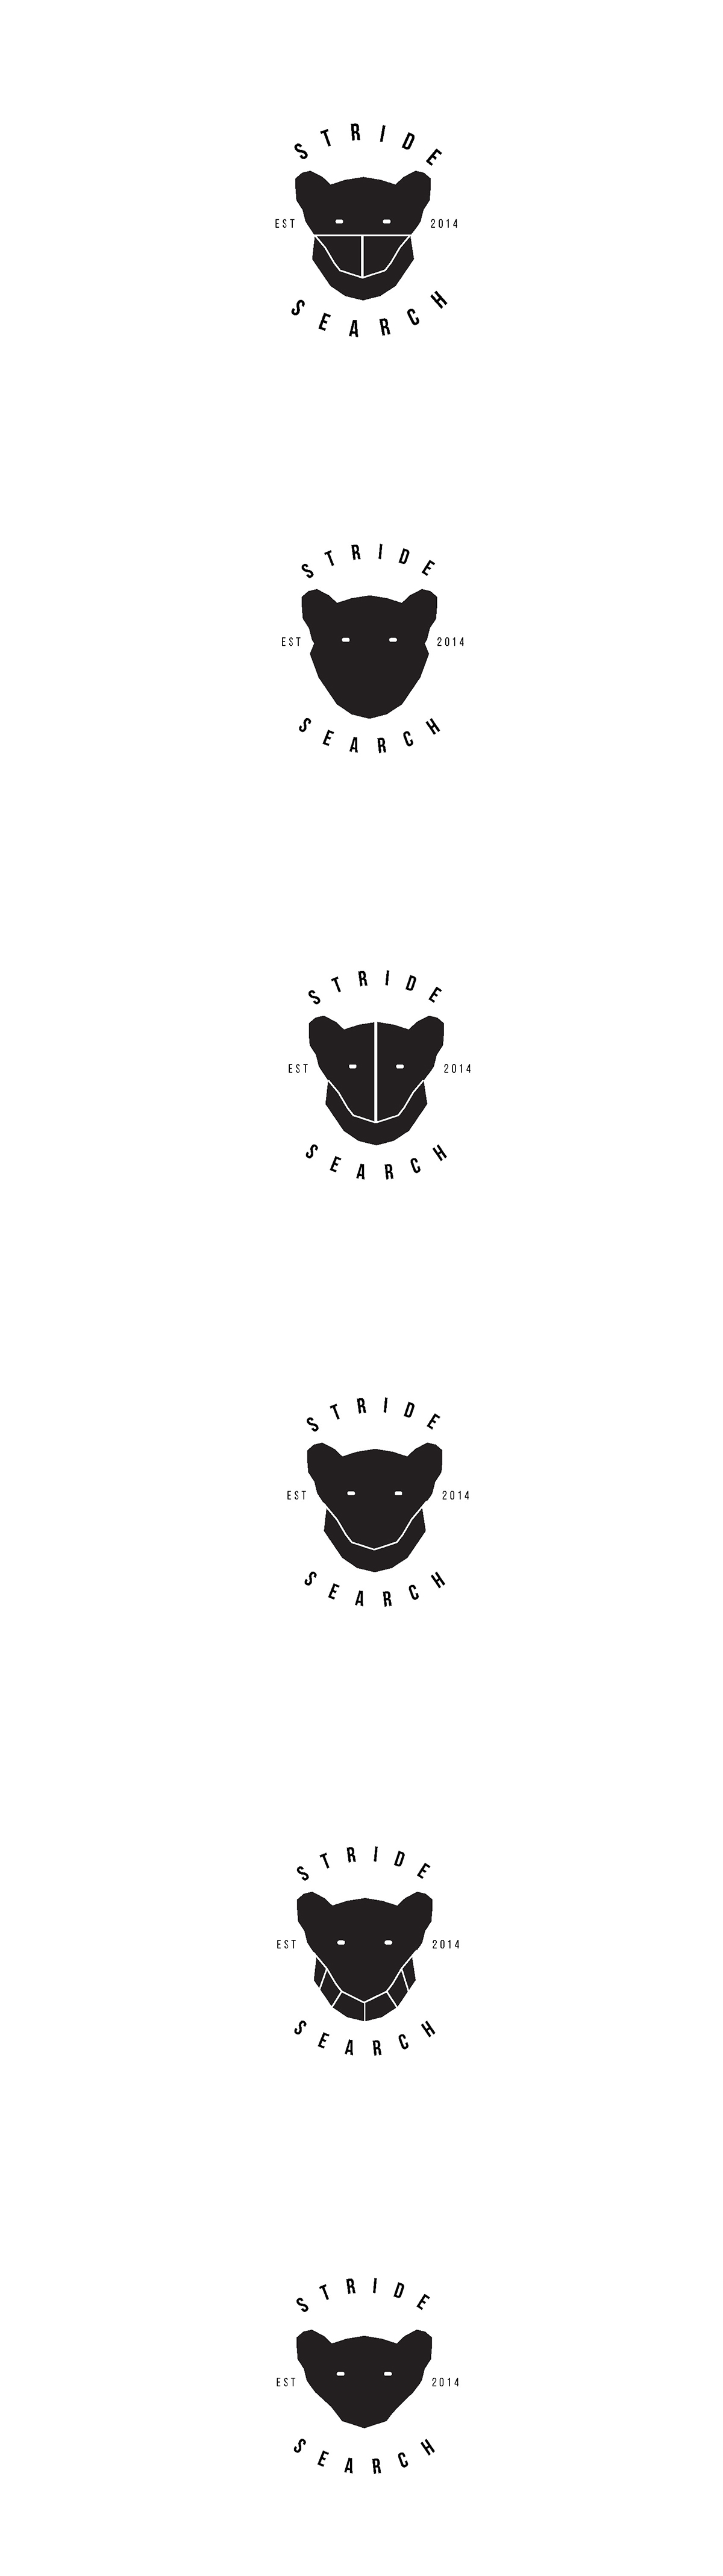 stride search concept 4 cheetah logo 2